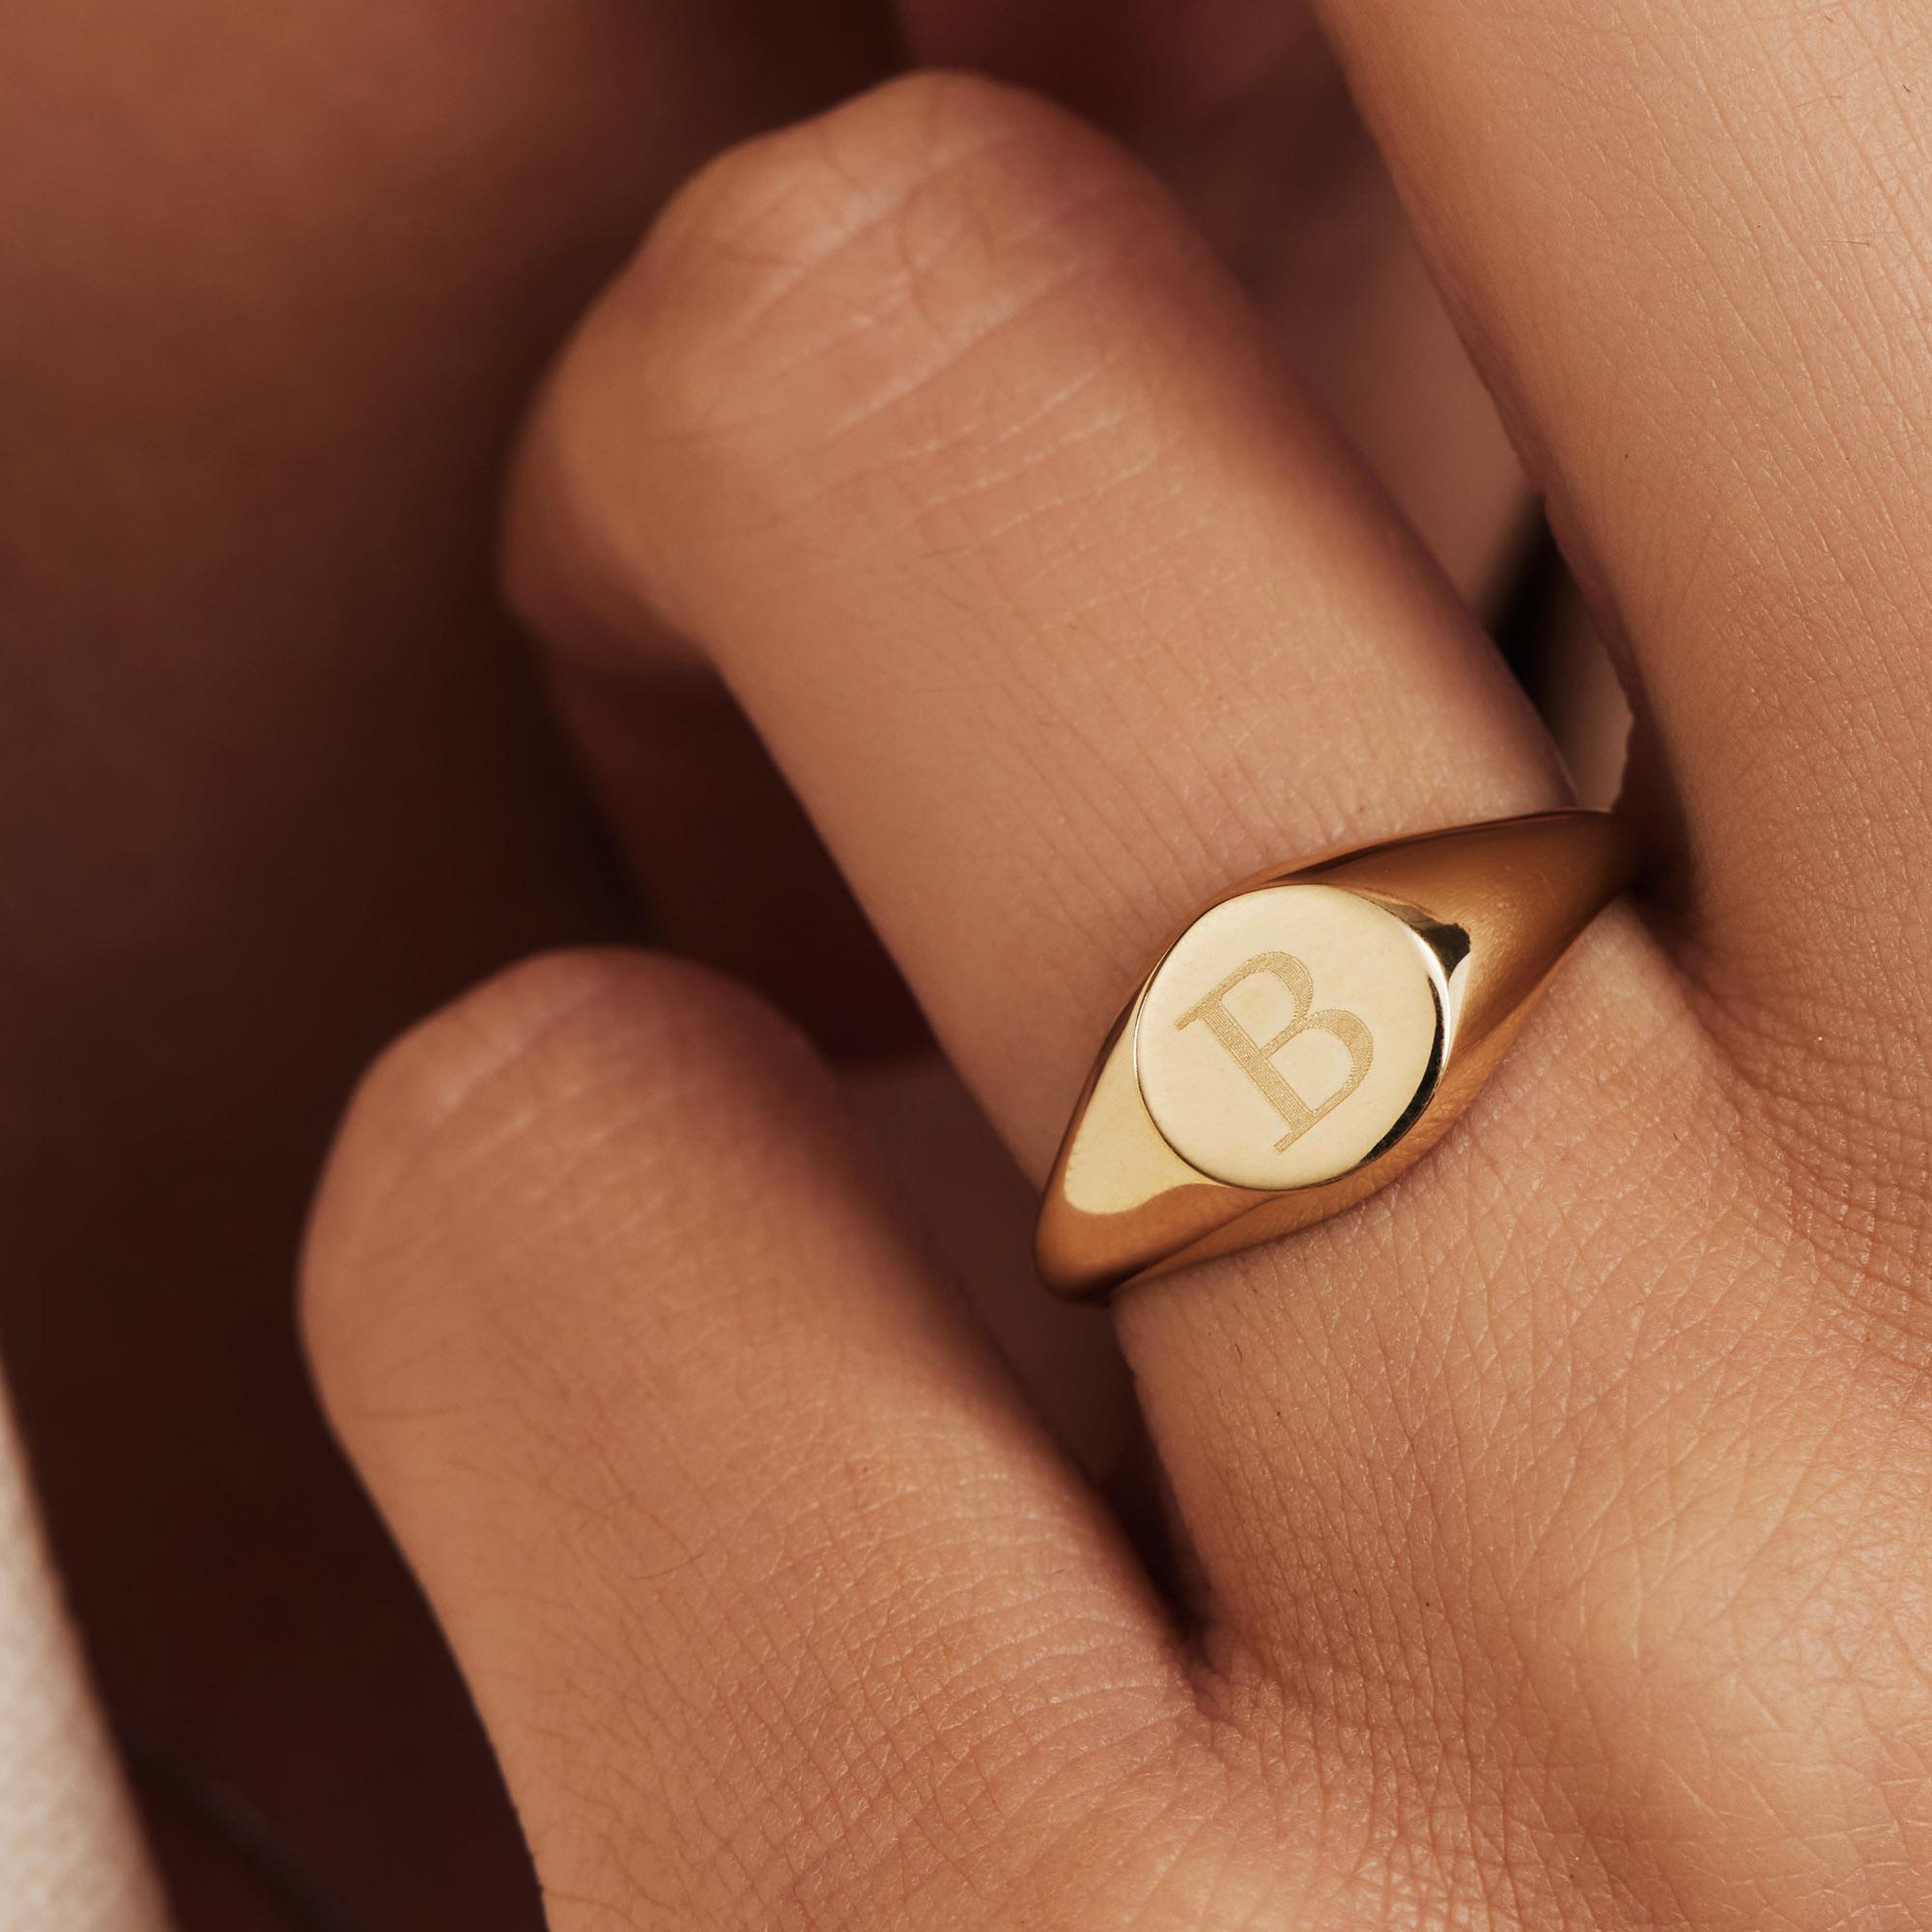 Isabel Bernard Le Marais Lauren 14 karat gold initial signet ring with letter (54)